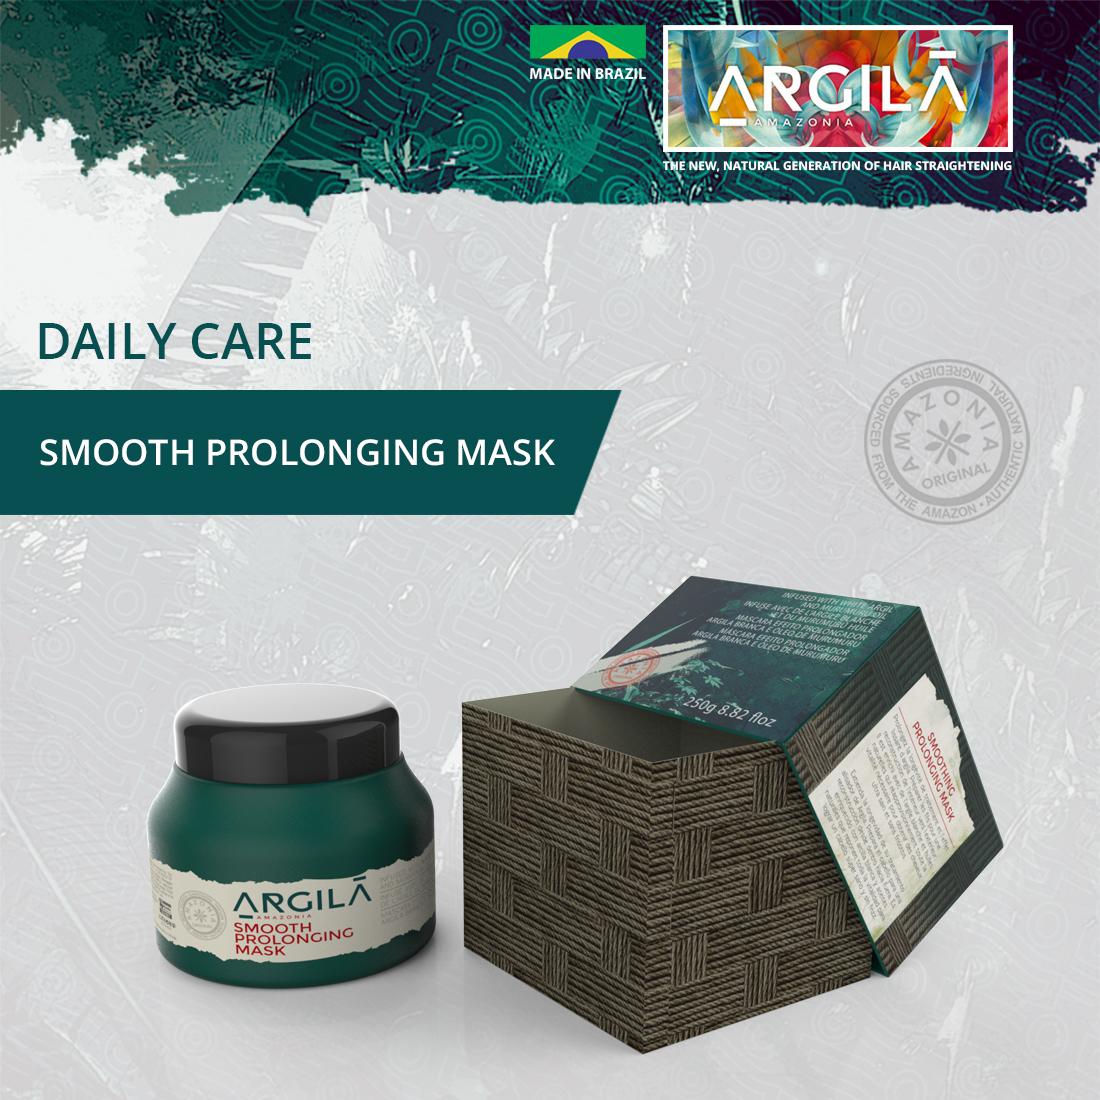 Media Kit Argila Amazônia 7.jpg